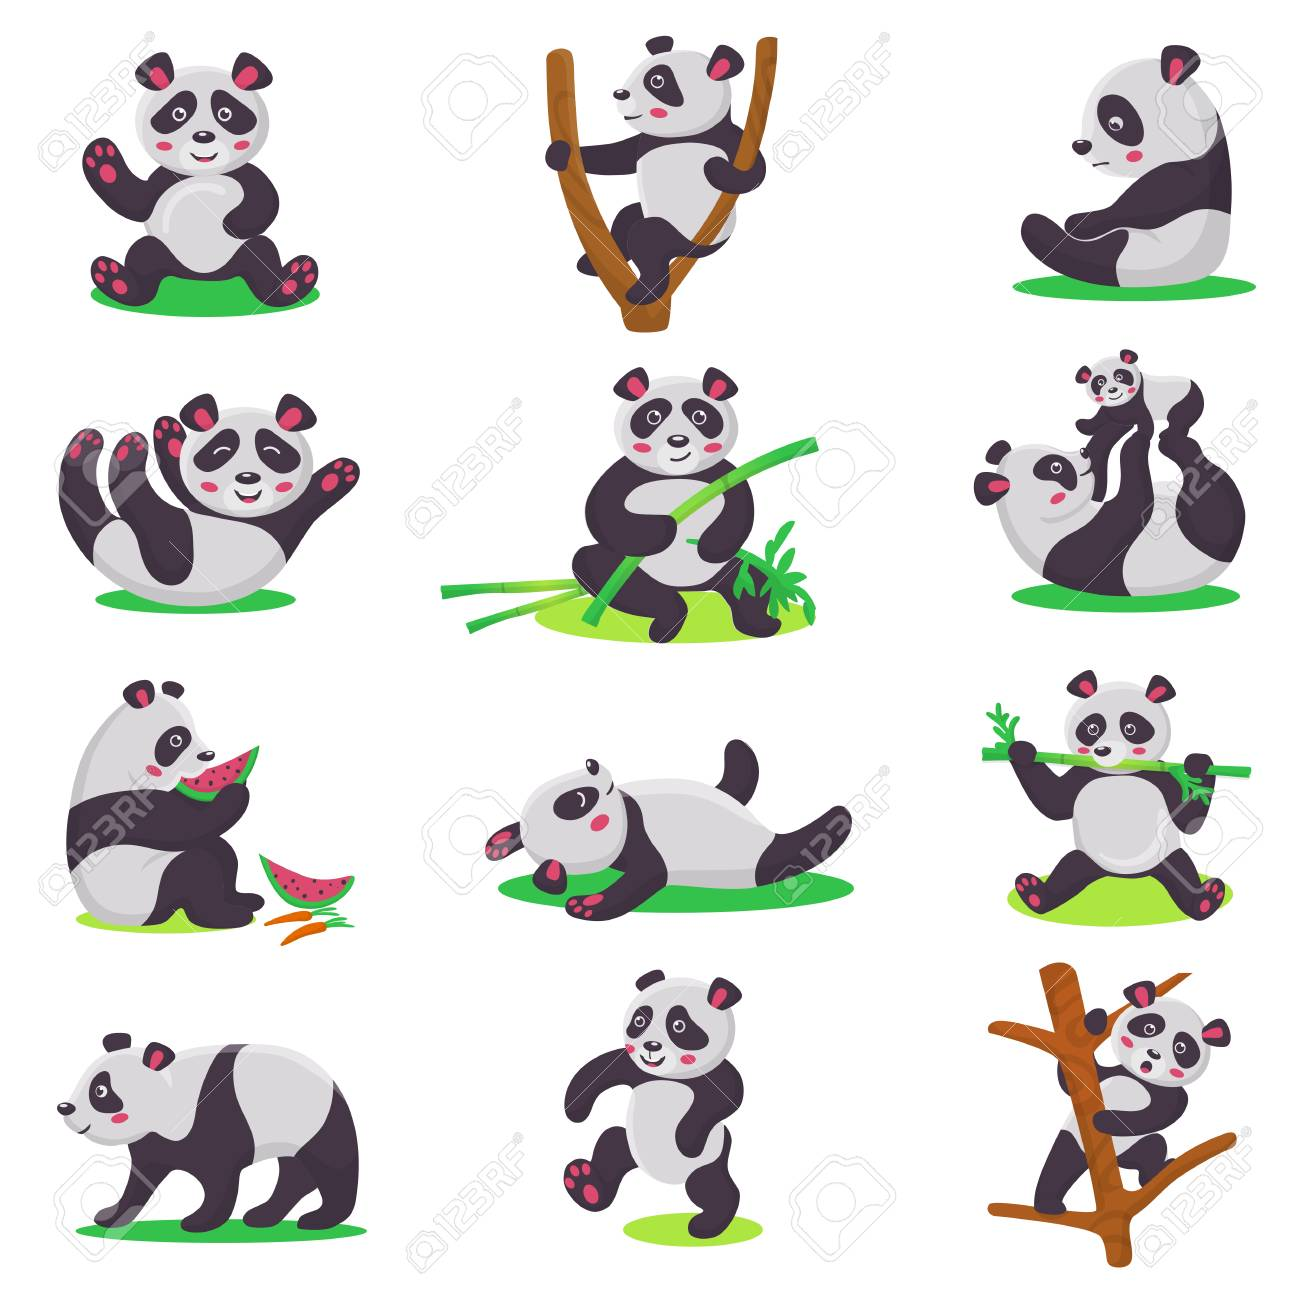 Panda kid vector bearcat character or chinese bear child playing or eating bamboo illustration set of cartoon giant panda isolated on white background - 100957082